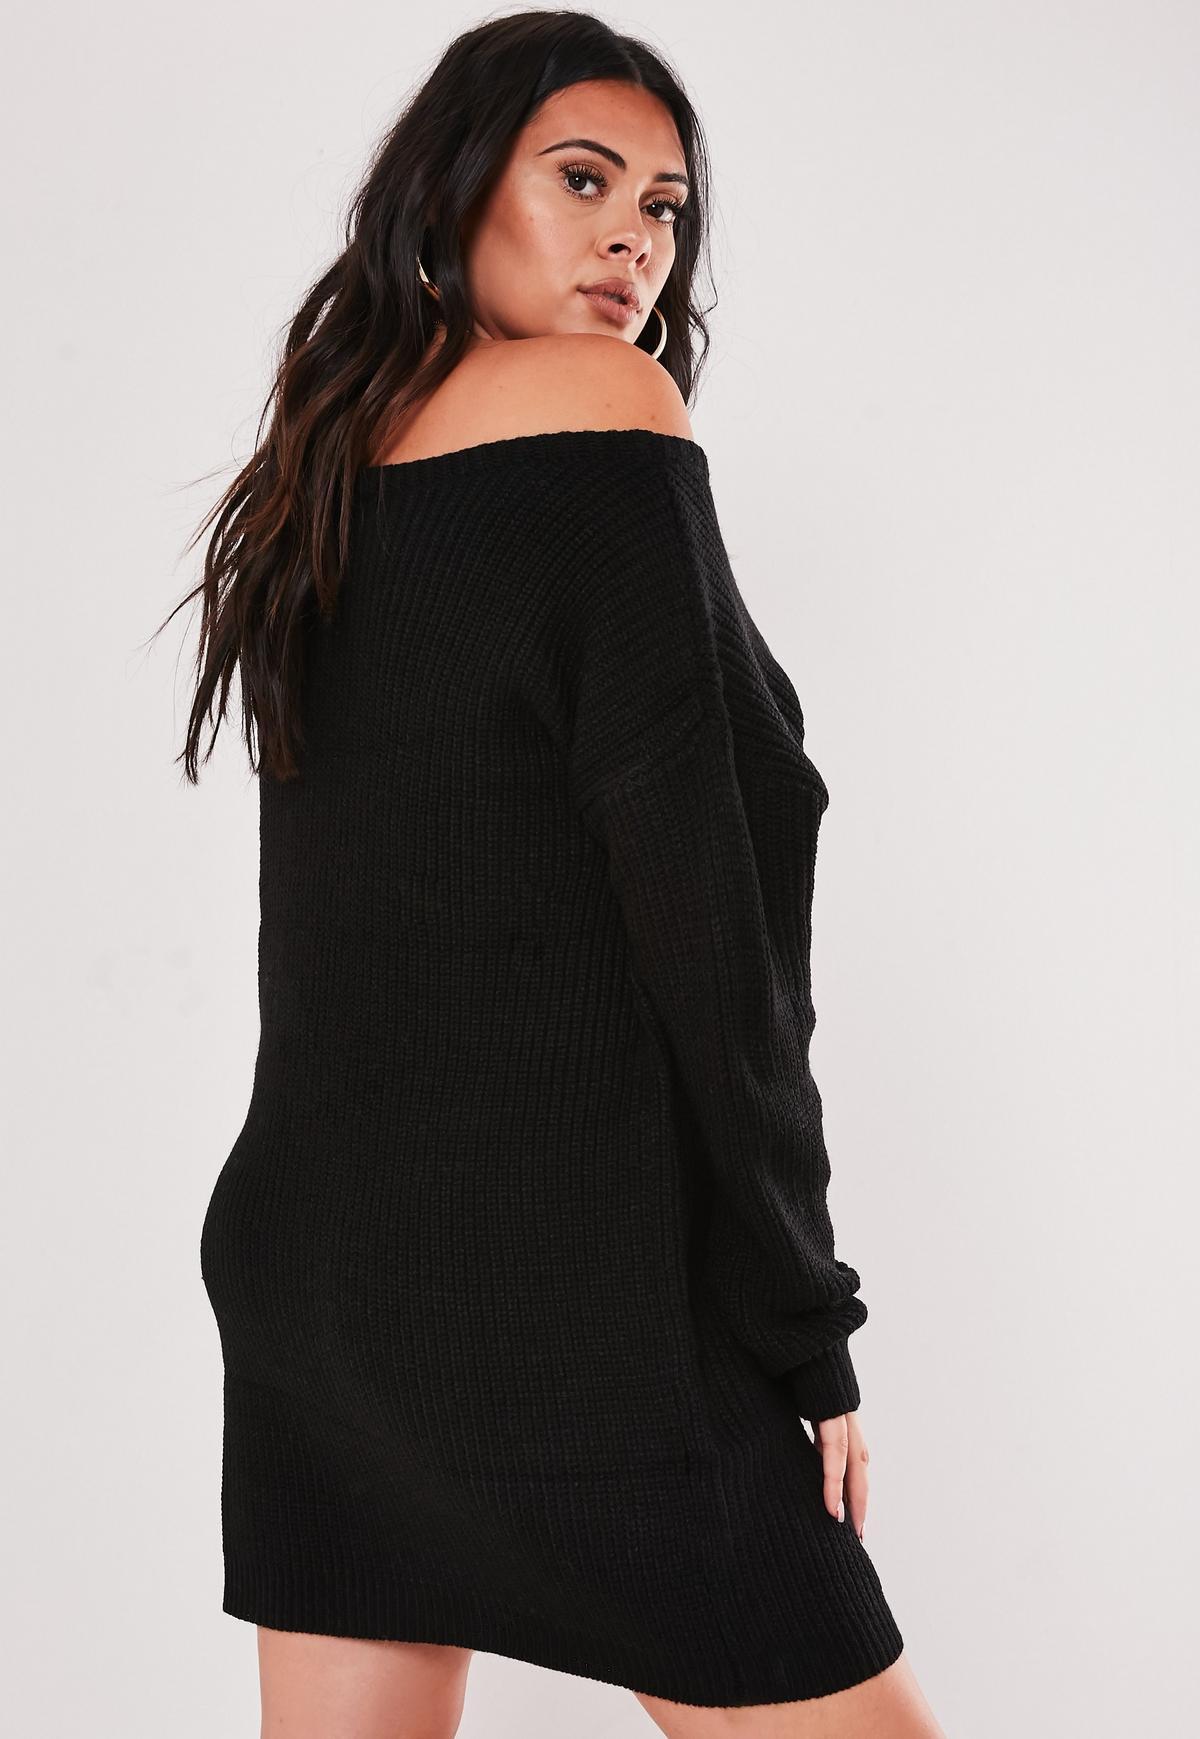 Plus Size Black Off The Shoulder Sweater Dress